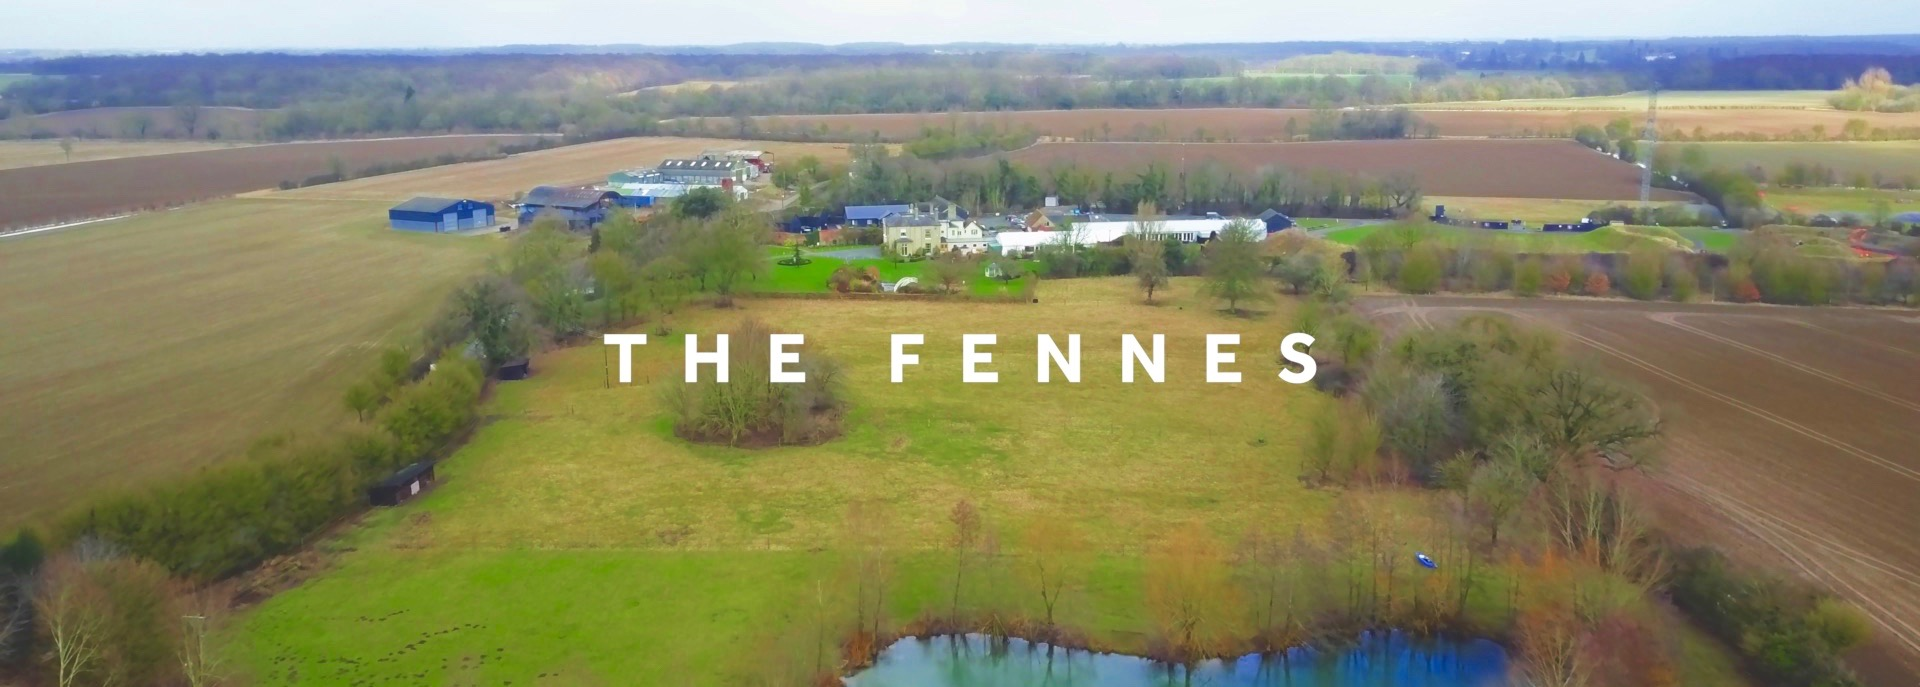 Fennes Braintree Wedding Video